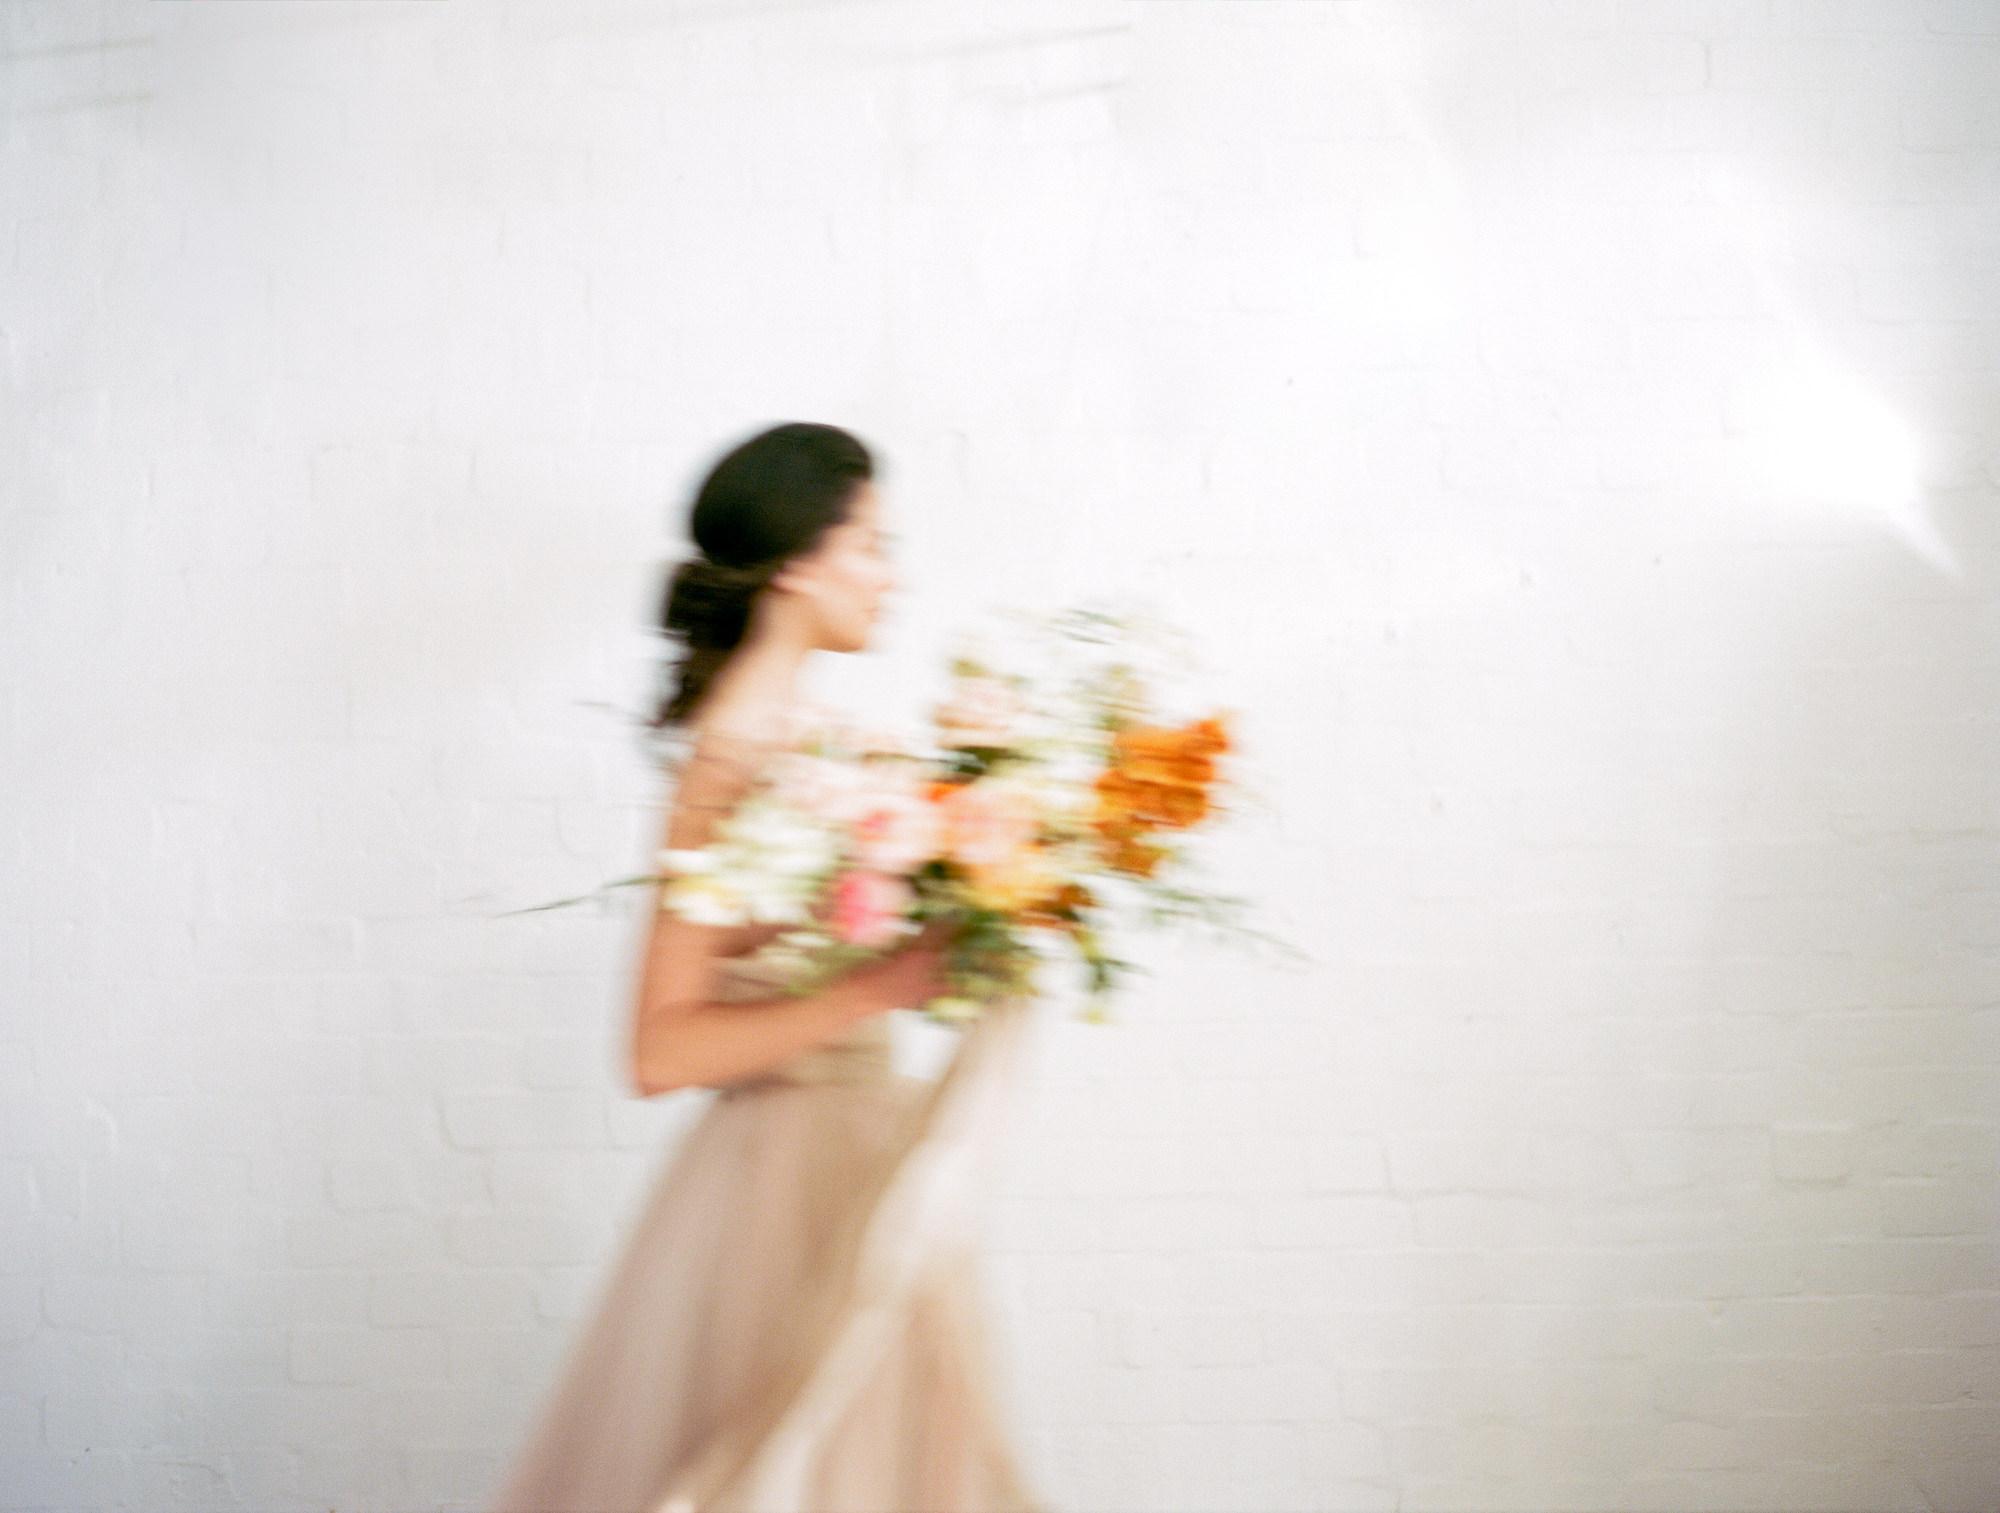 sandra-chau-stylist-fine-art-editorial-shoot-wedding-inspiration-feminine-movement-unearthingtc-1.jpg